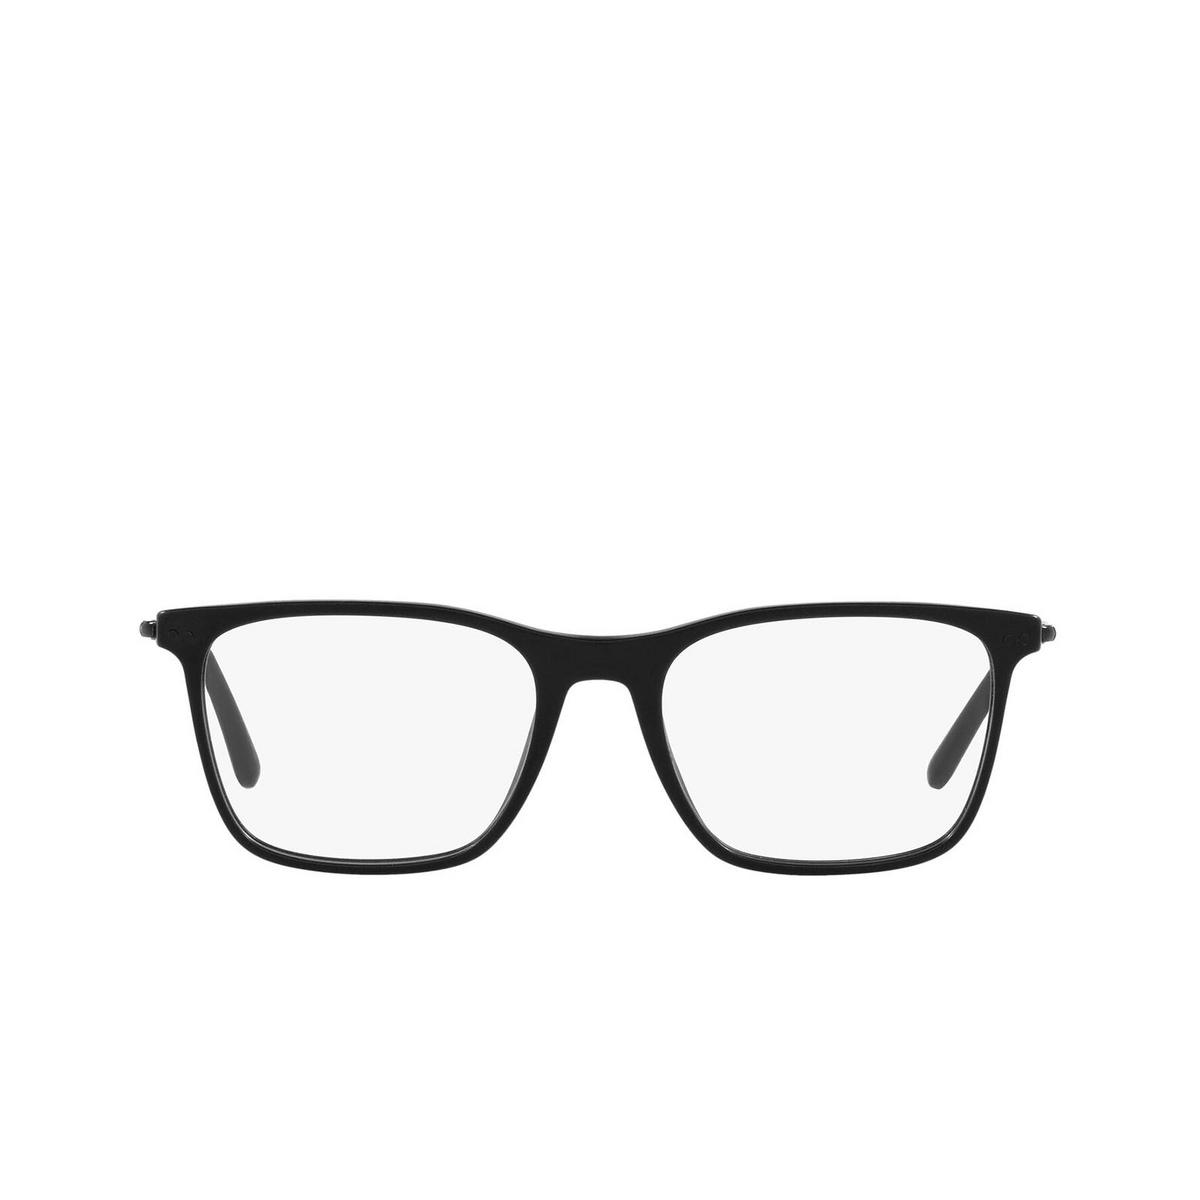 Giorgio Armani® Rectangle Eyeglasses: AR7197 color Matte Black 5042 - front view.